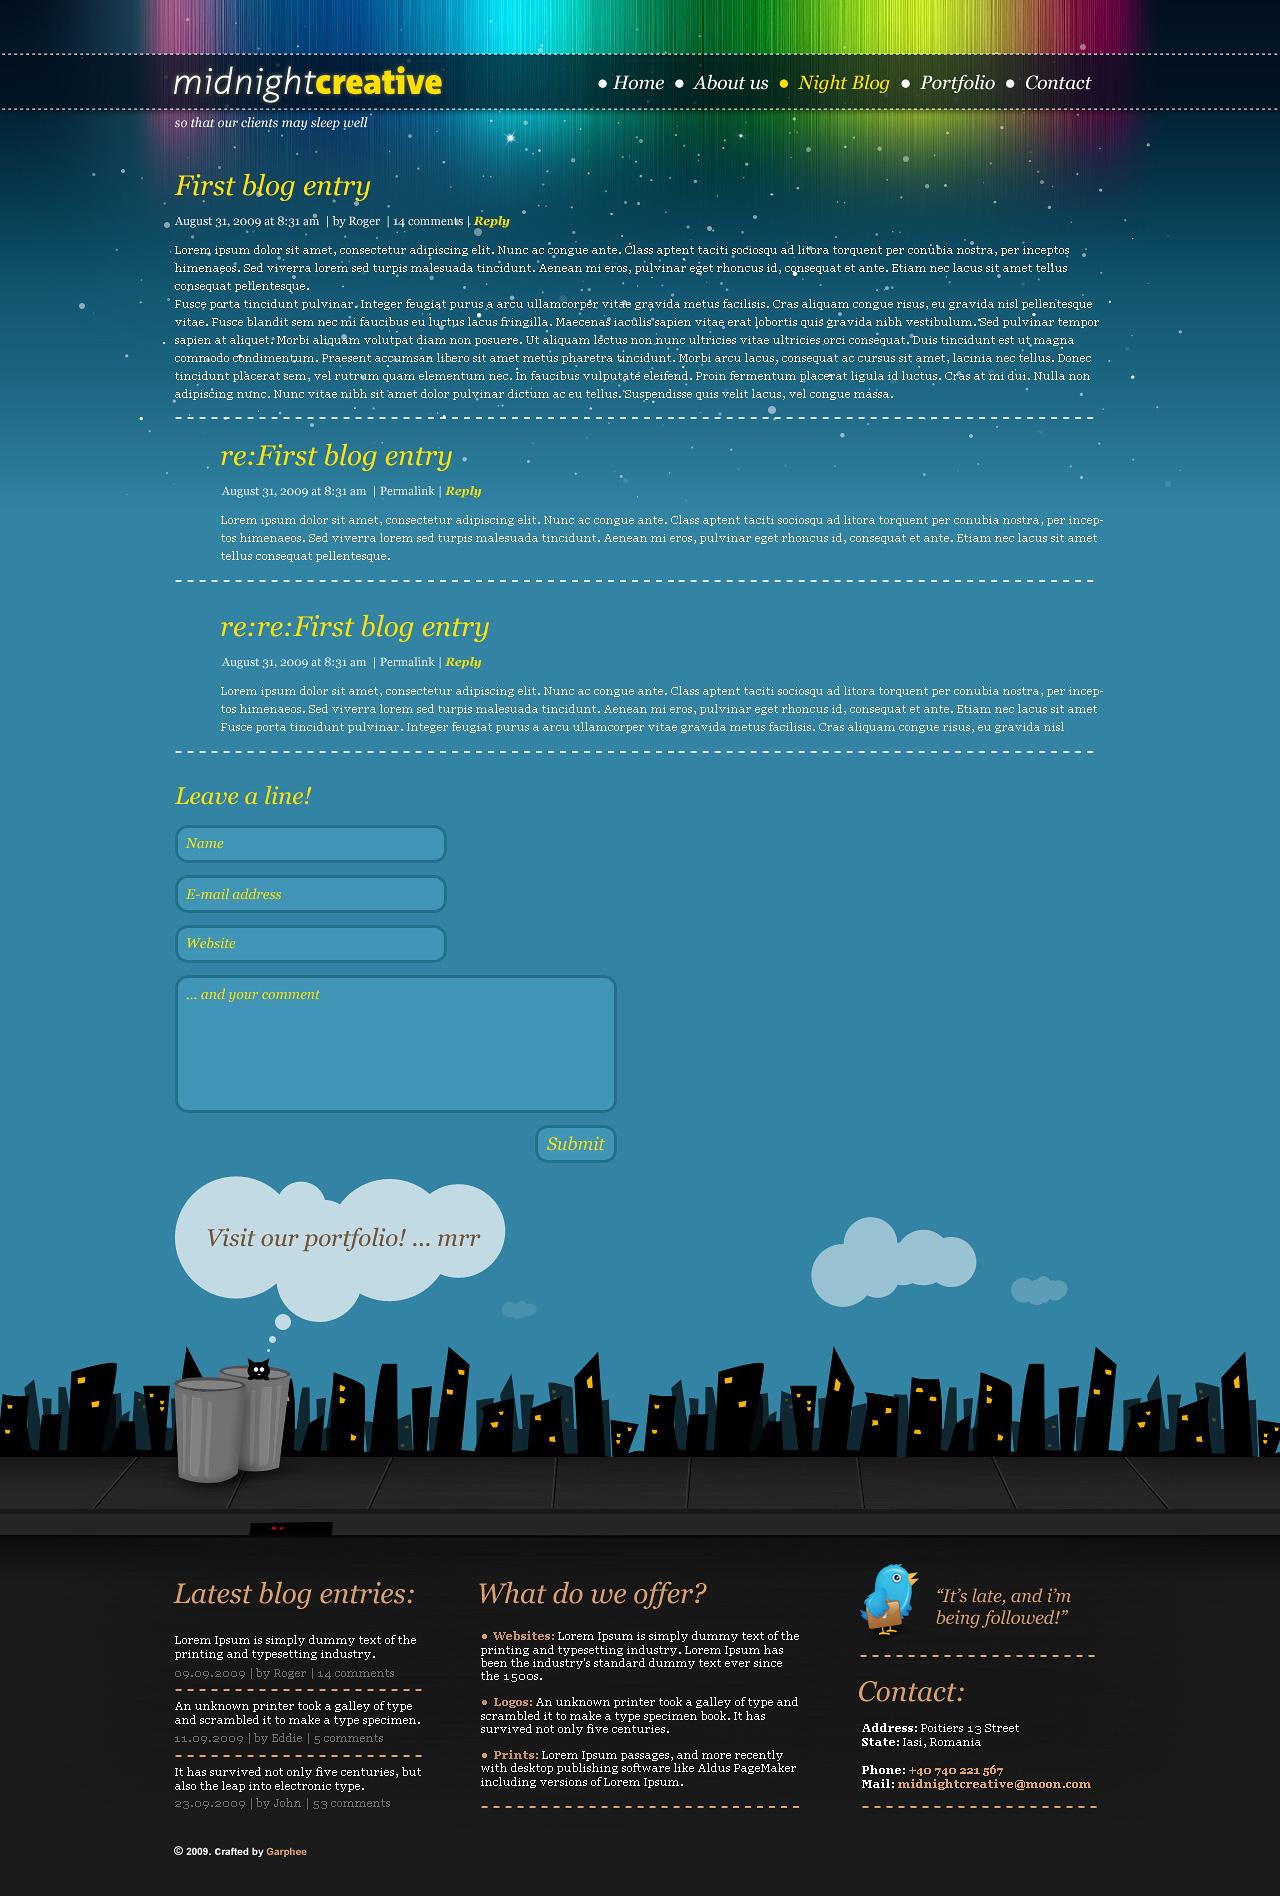 Midnight Creative - portfolio template.